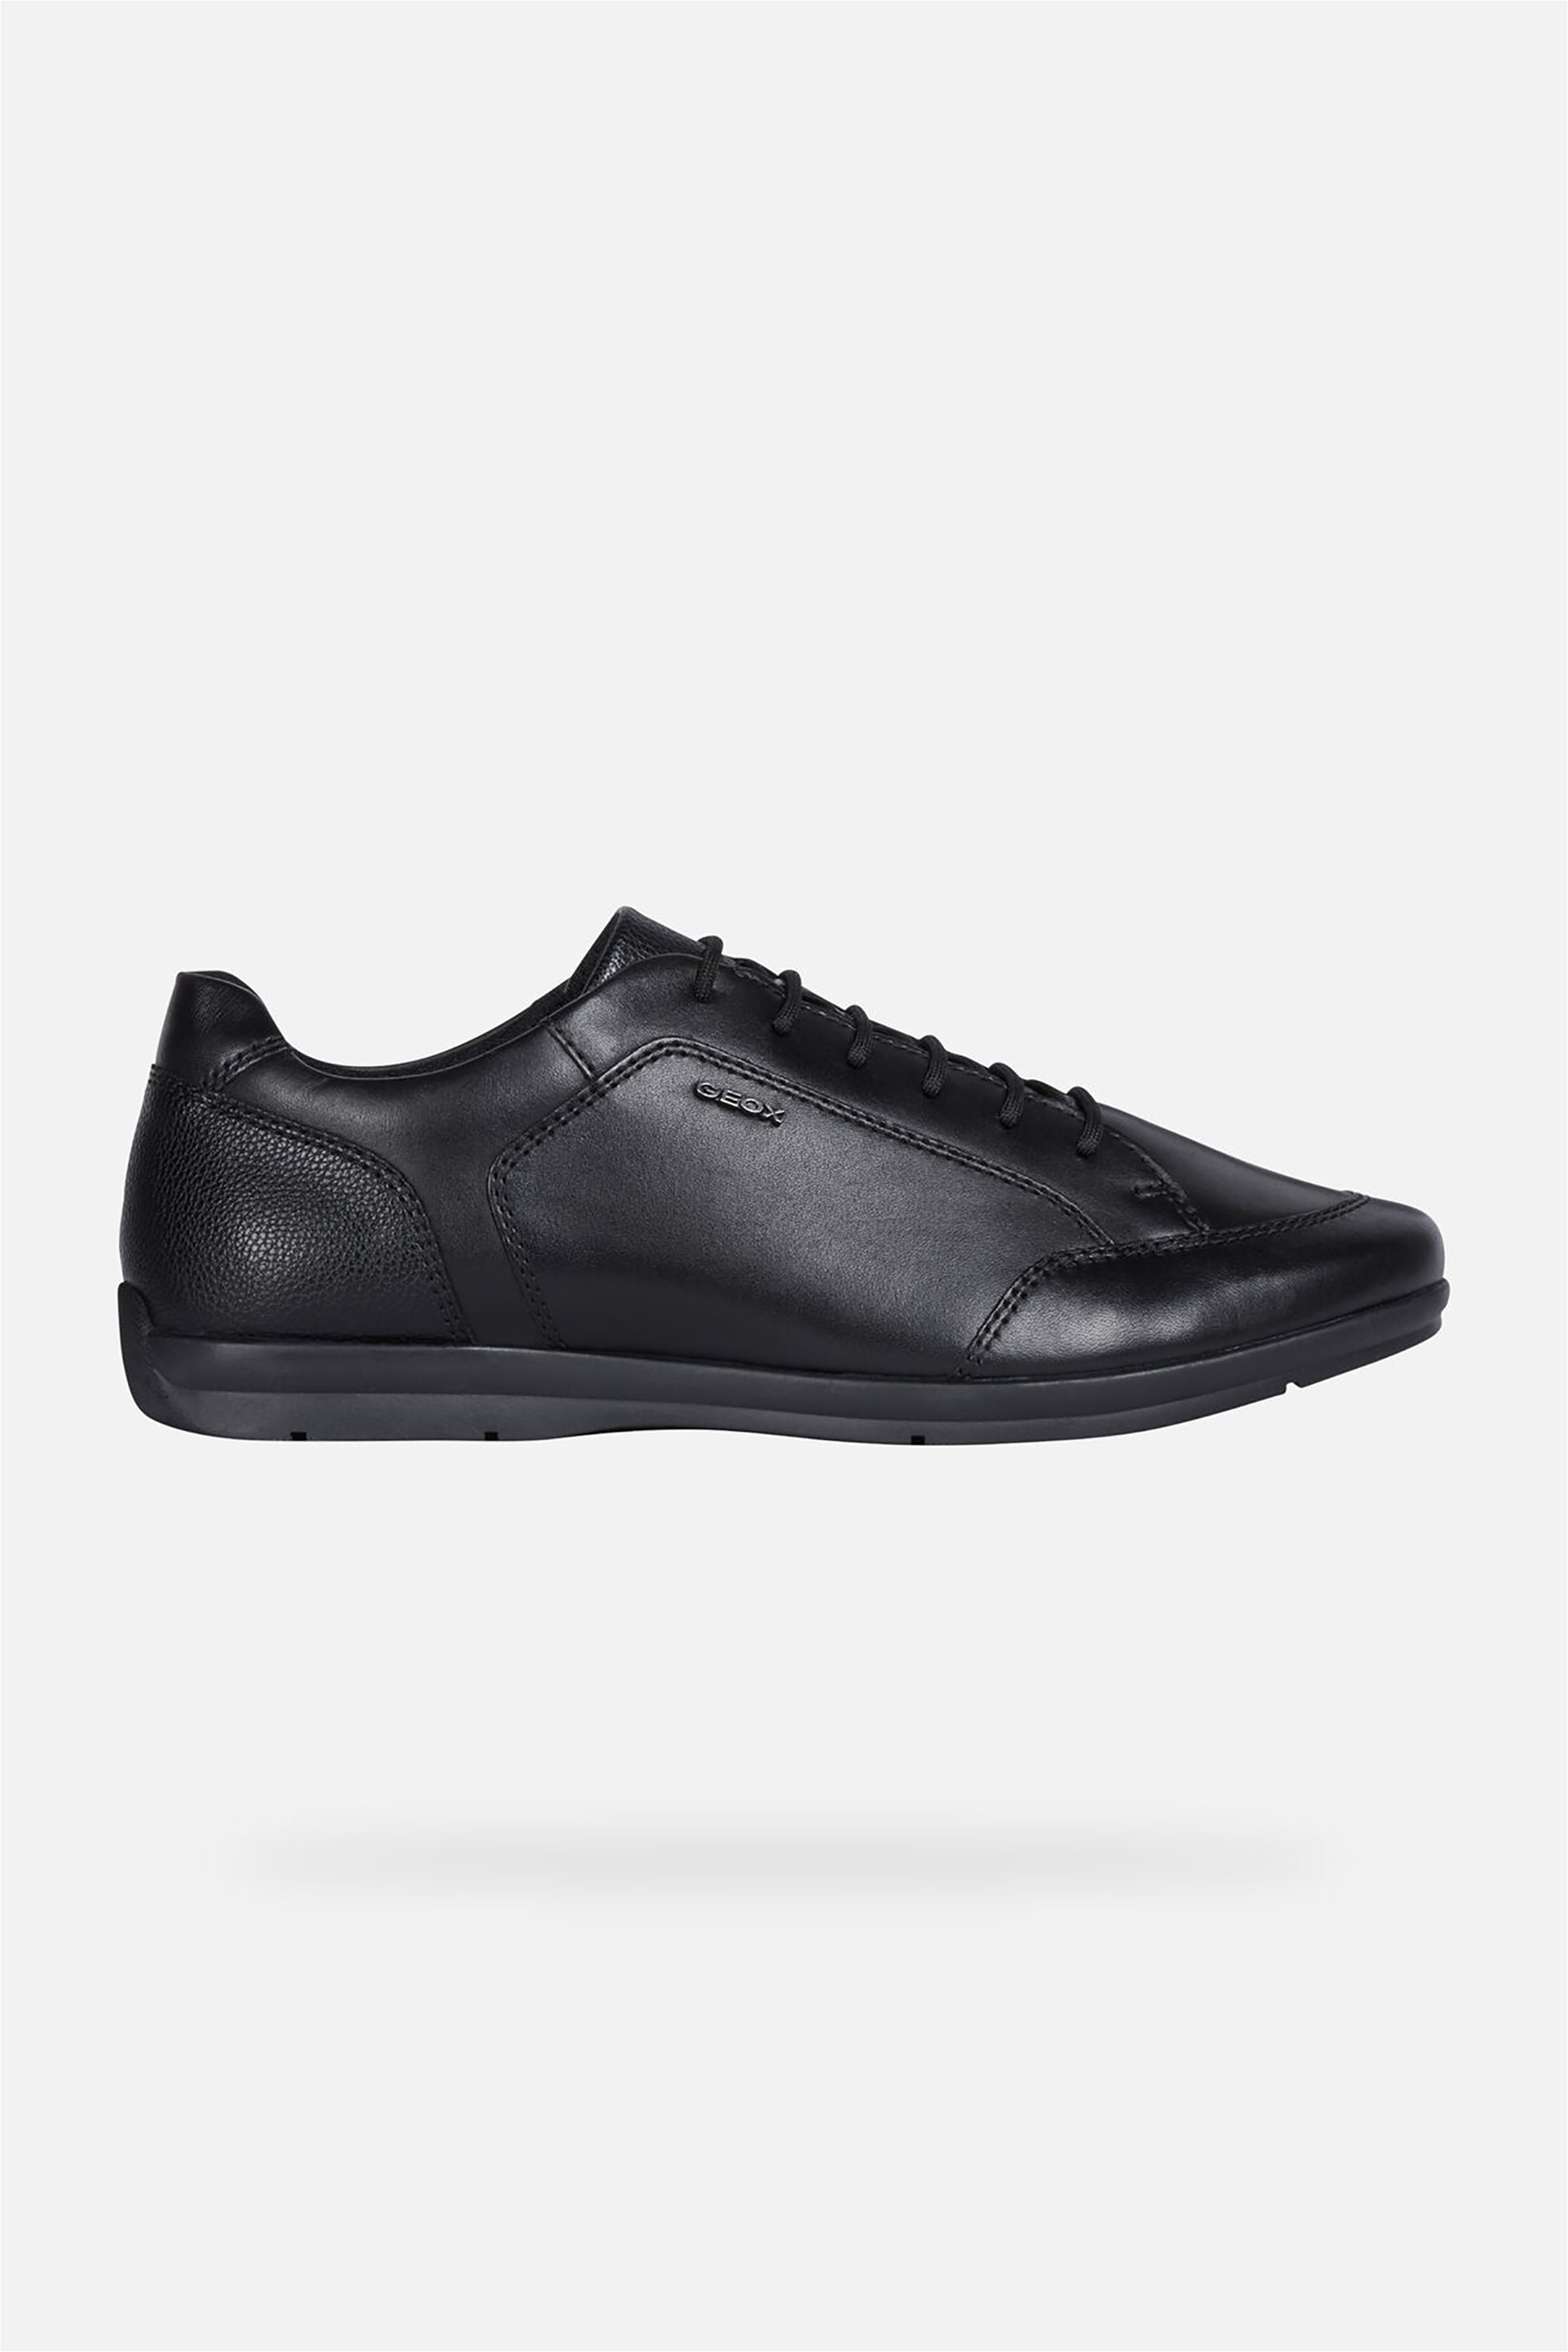 Geox ανδρικά παπούτσια με κορδόνια Adrien – U947VA – Μαύρο